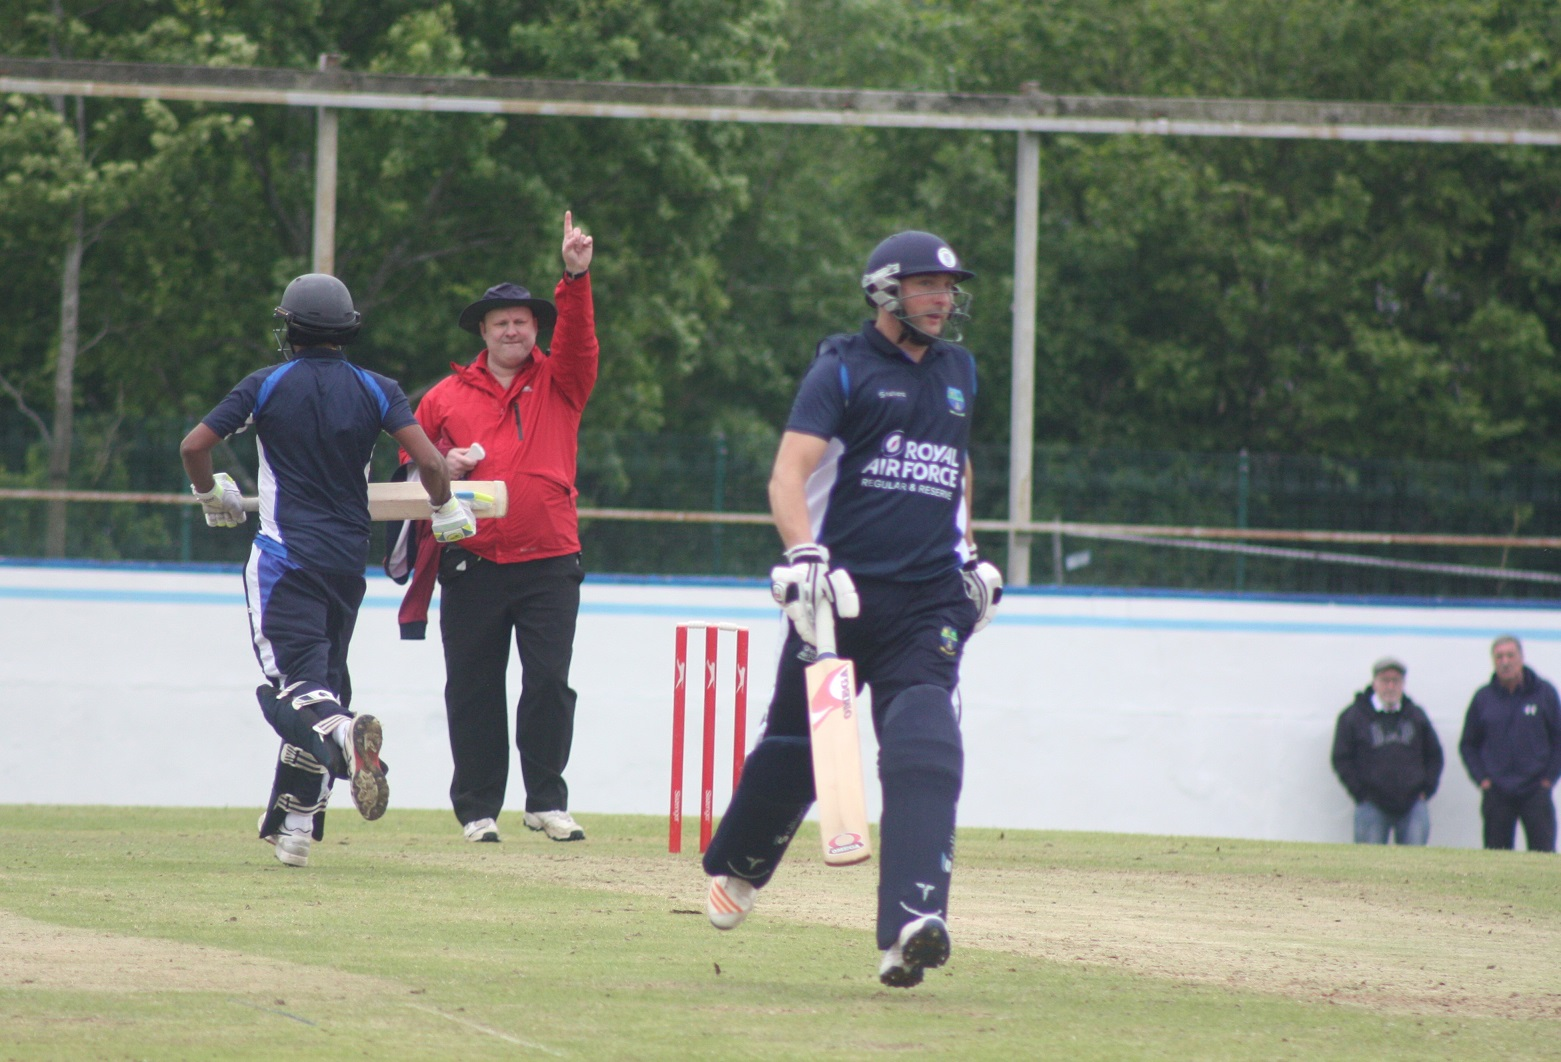 Umpire Matt Alott signals the end of Keshan Wijerathne's innings